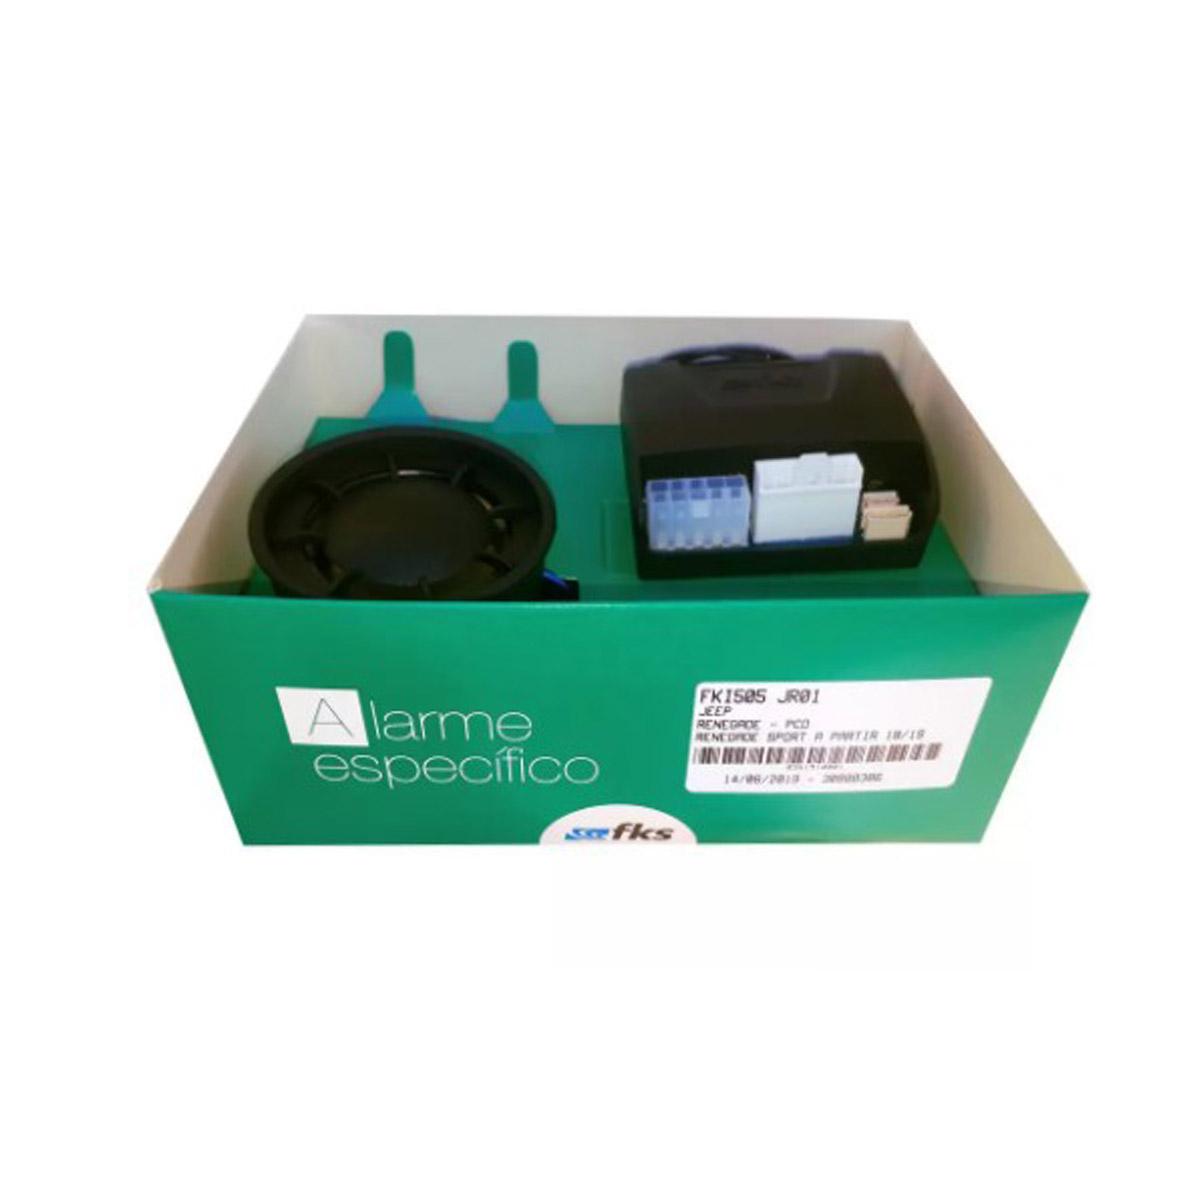 Alarme Específico Para Jeep Renegade com Chaveador Eletrônico FKI505 JR01